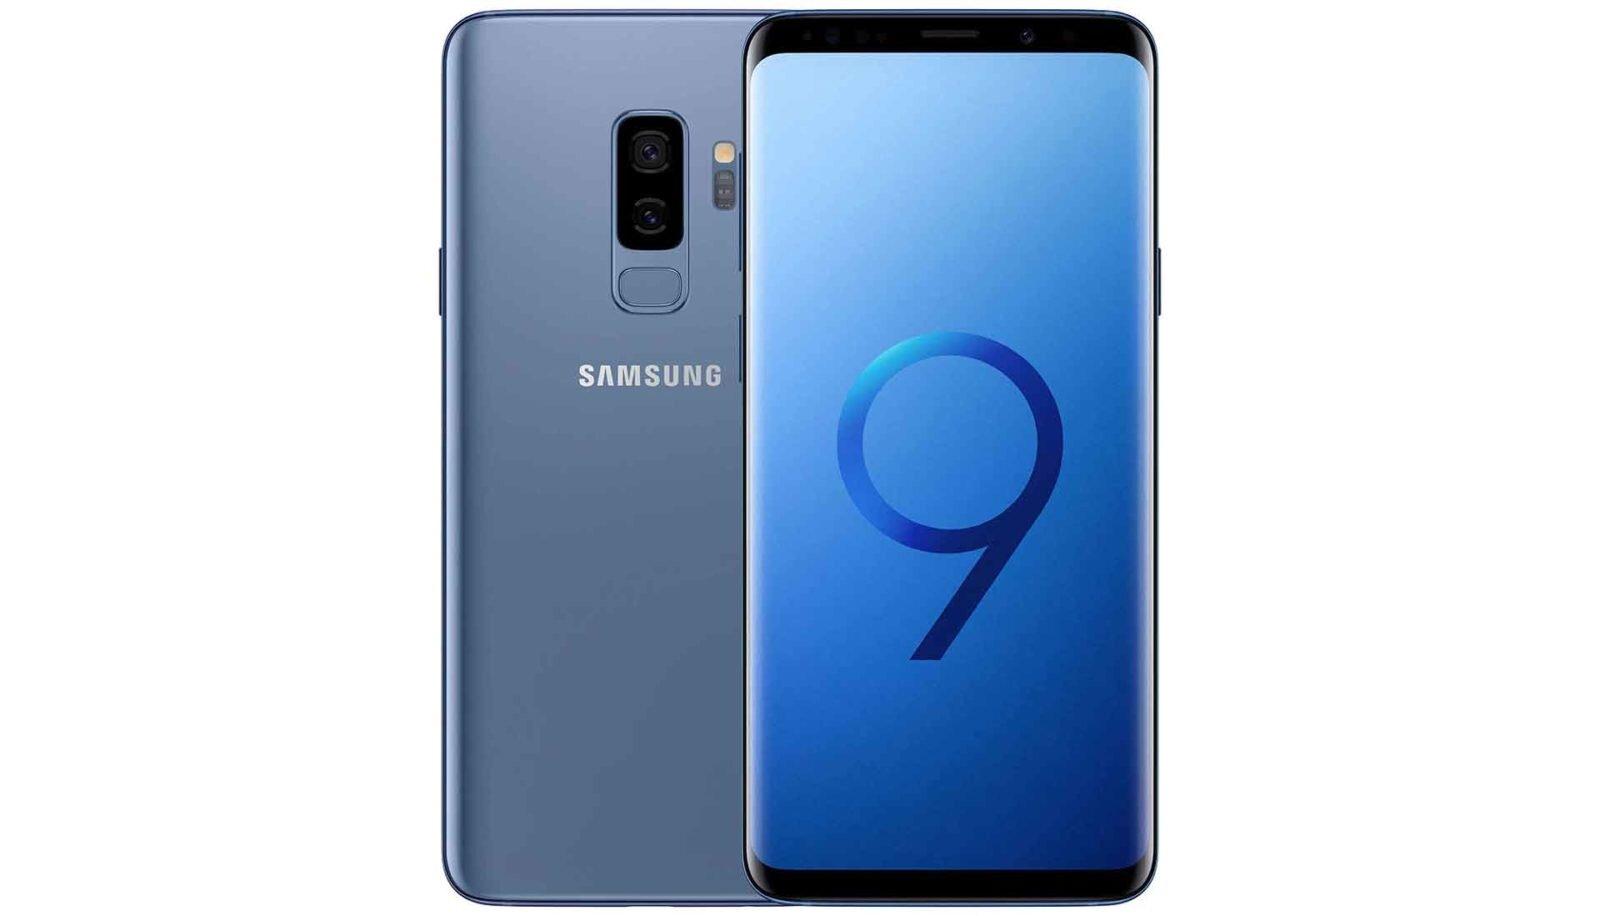 Điện thoại Samsung Galaxy S9 - 64GB, 5.8 inch